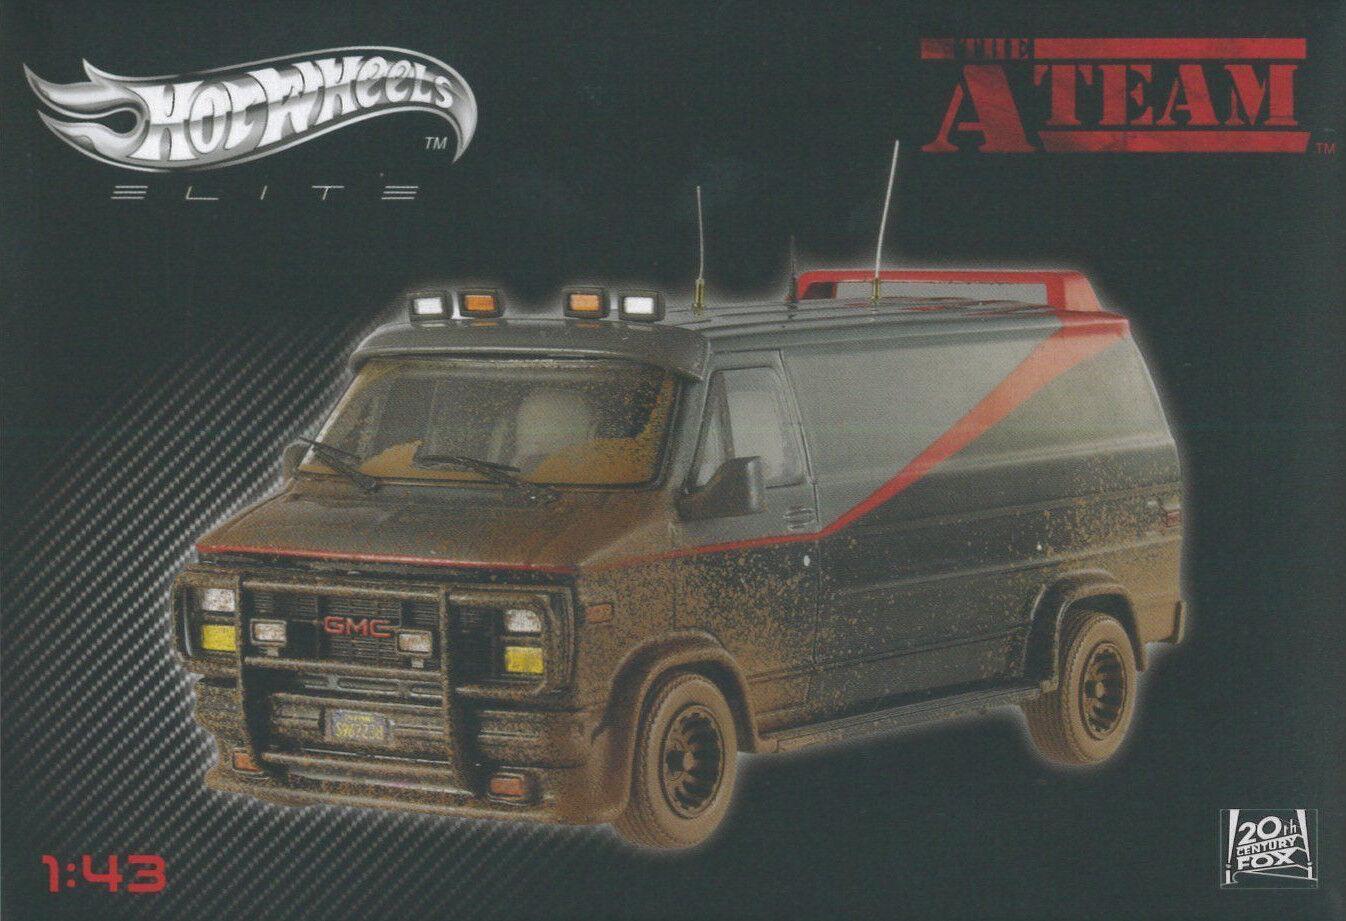 Van Agence Tous Risques/A-Team - Hot Wheels Elite 1/43